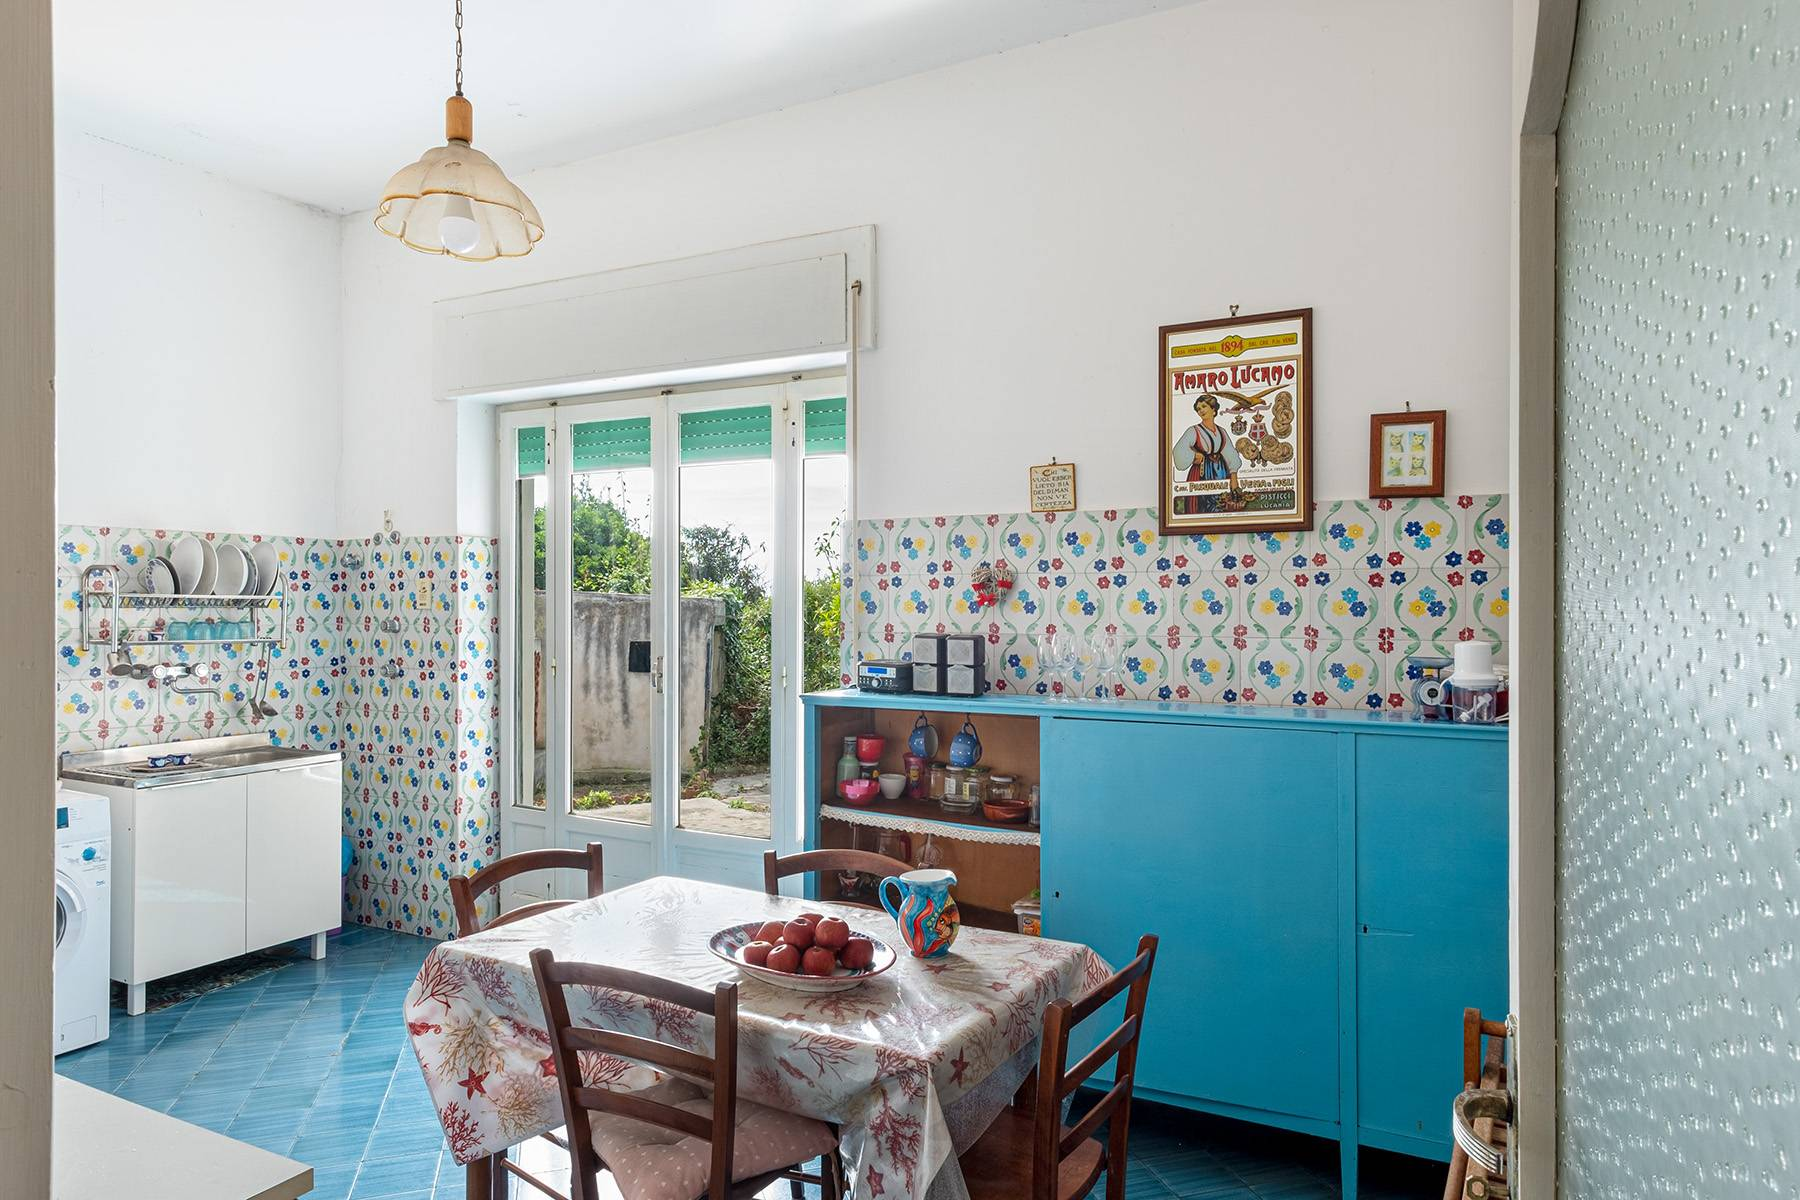 Casa indipendente in Vendita a Procida: 5 locali, 300 mq - Foto 6